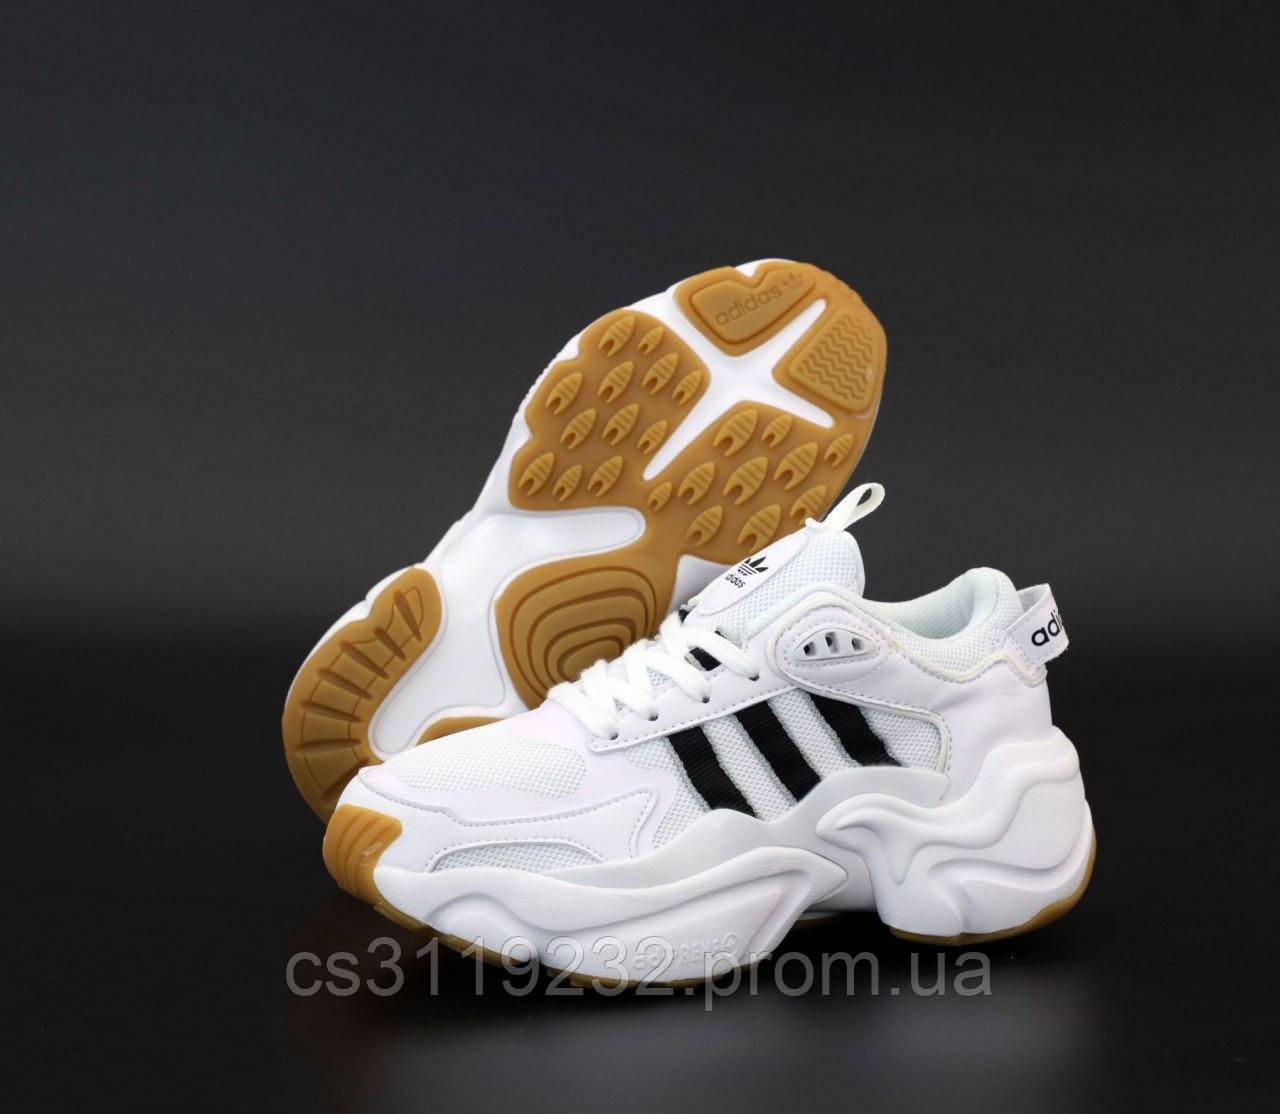 Мужские кроссовки Adidas Consortium x Naked Magmur Runner White (белые)